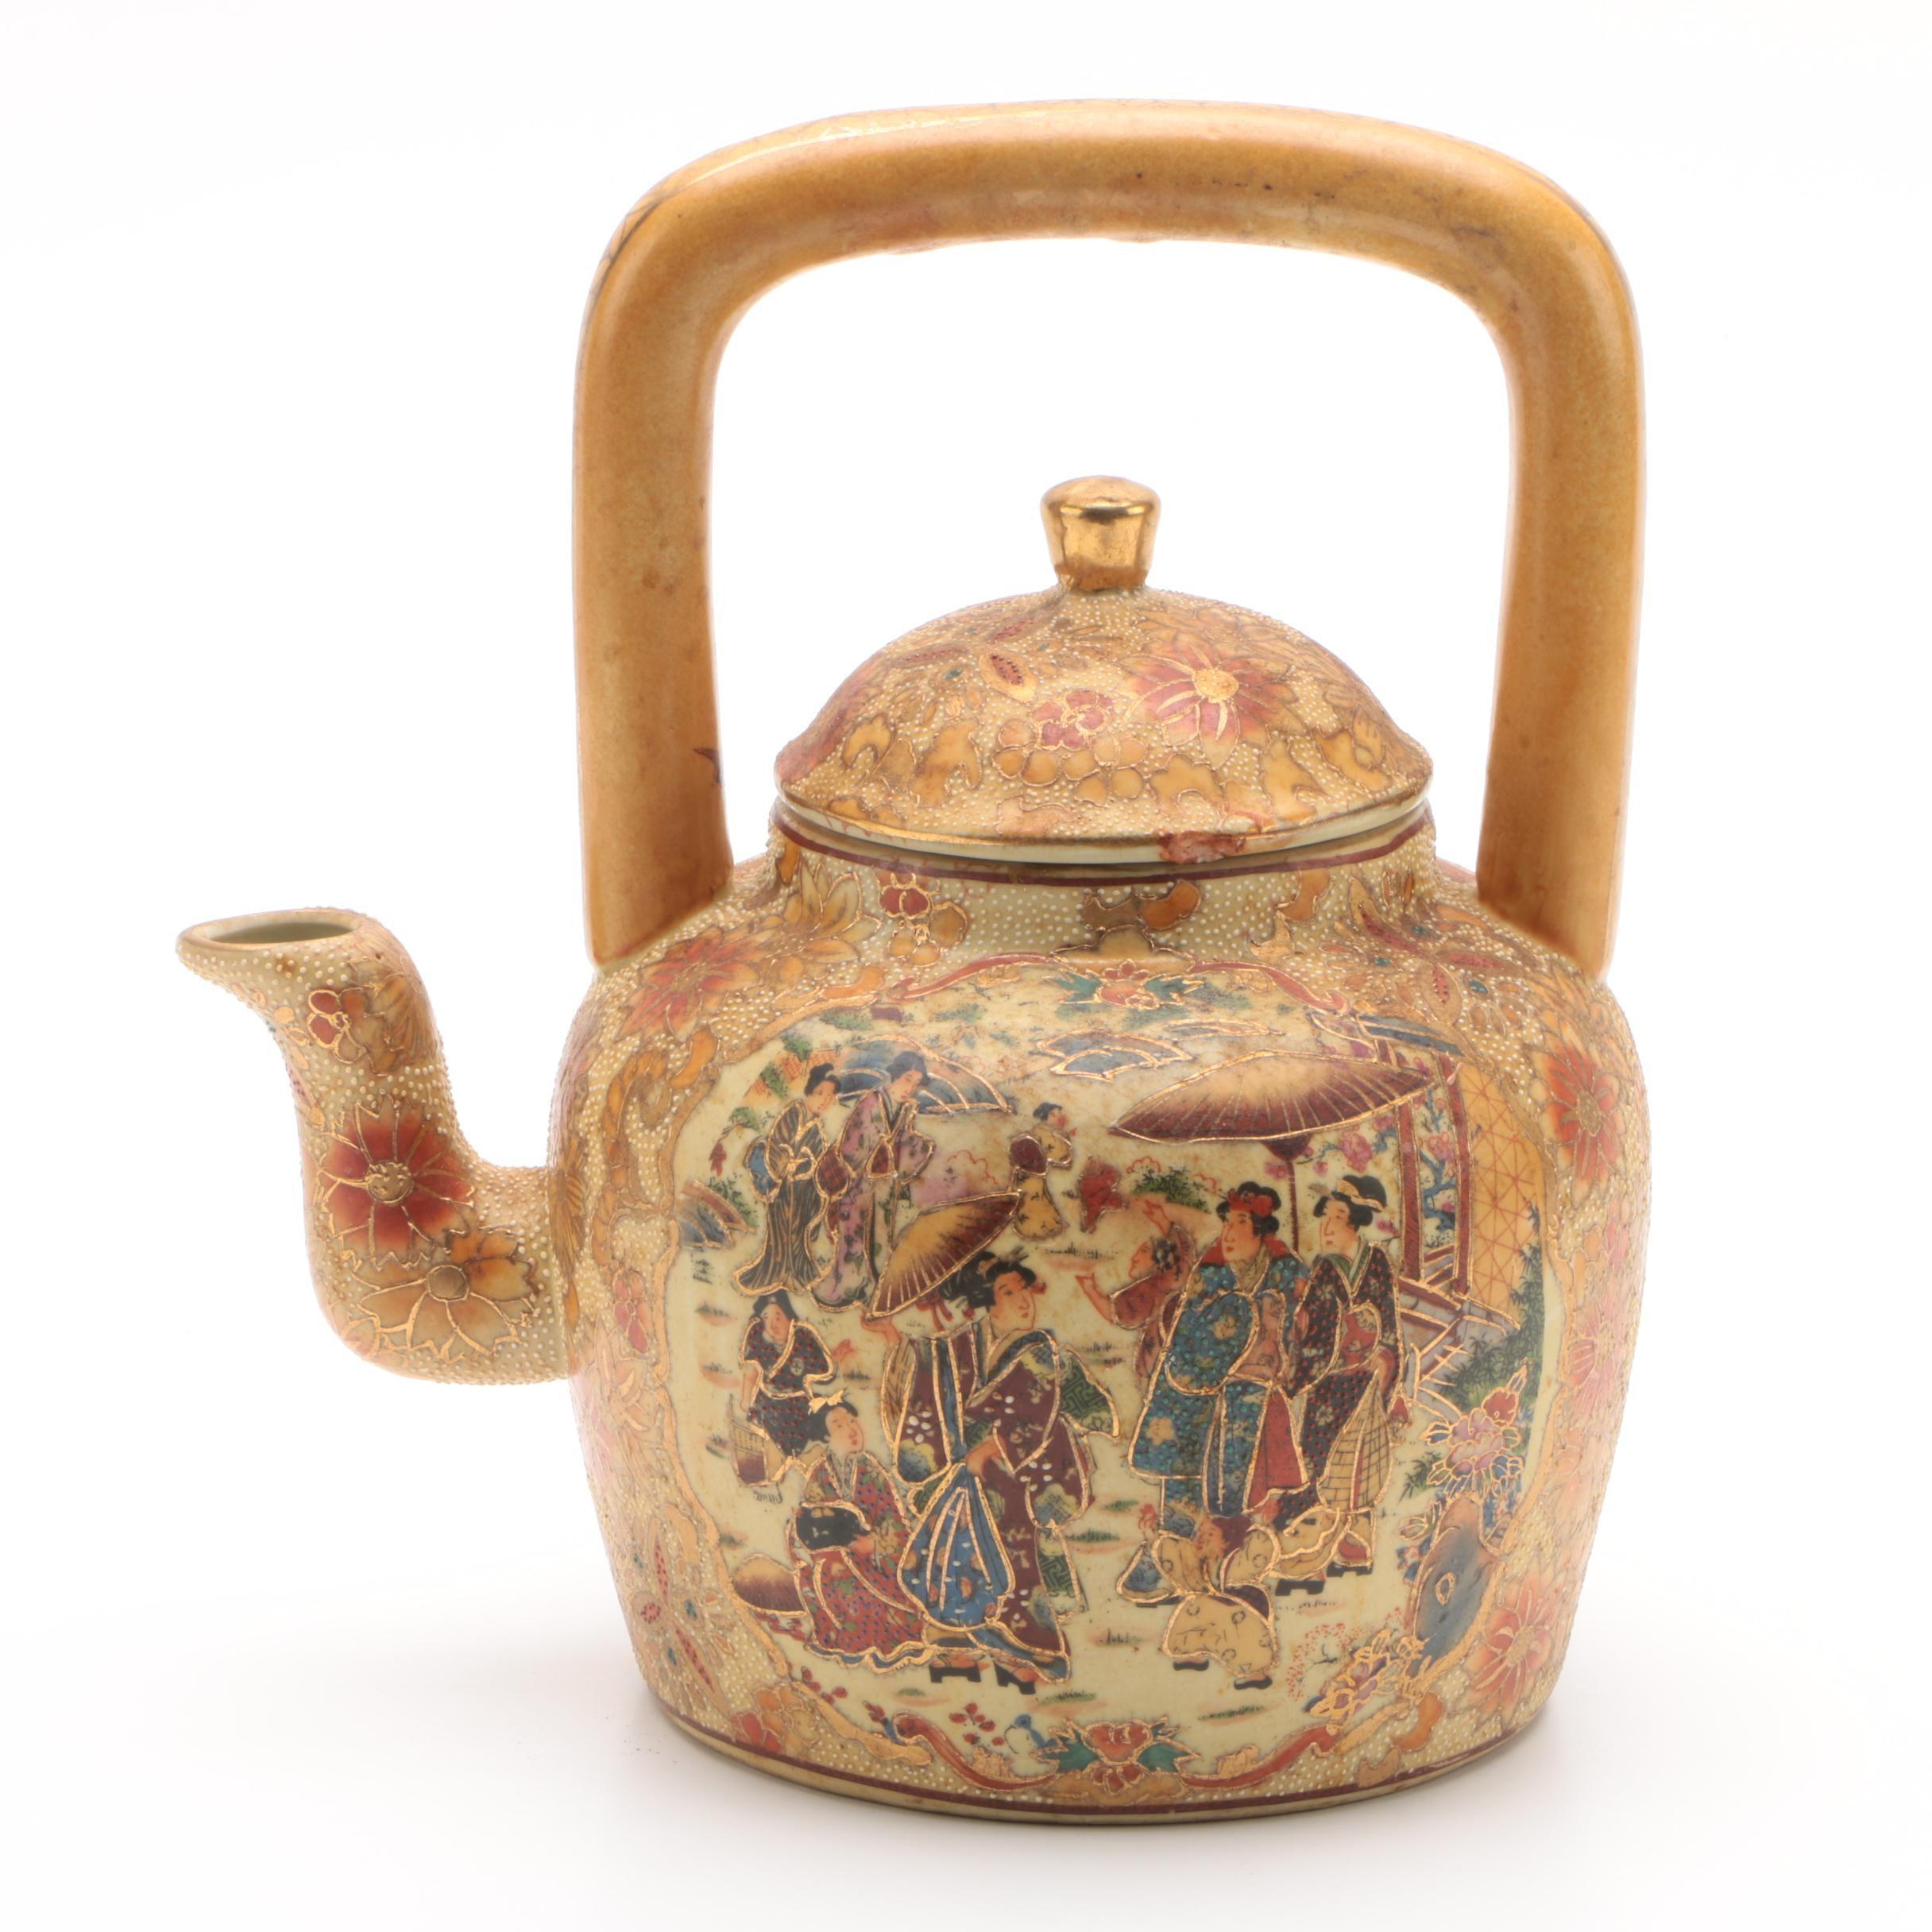 Vintage Chinese Satsuma Style Ceramic Teapot